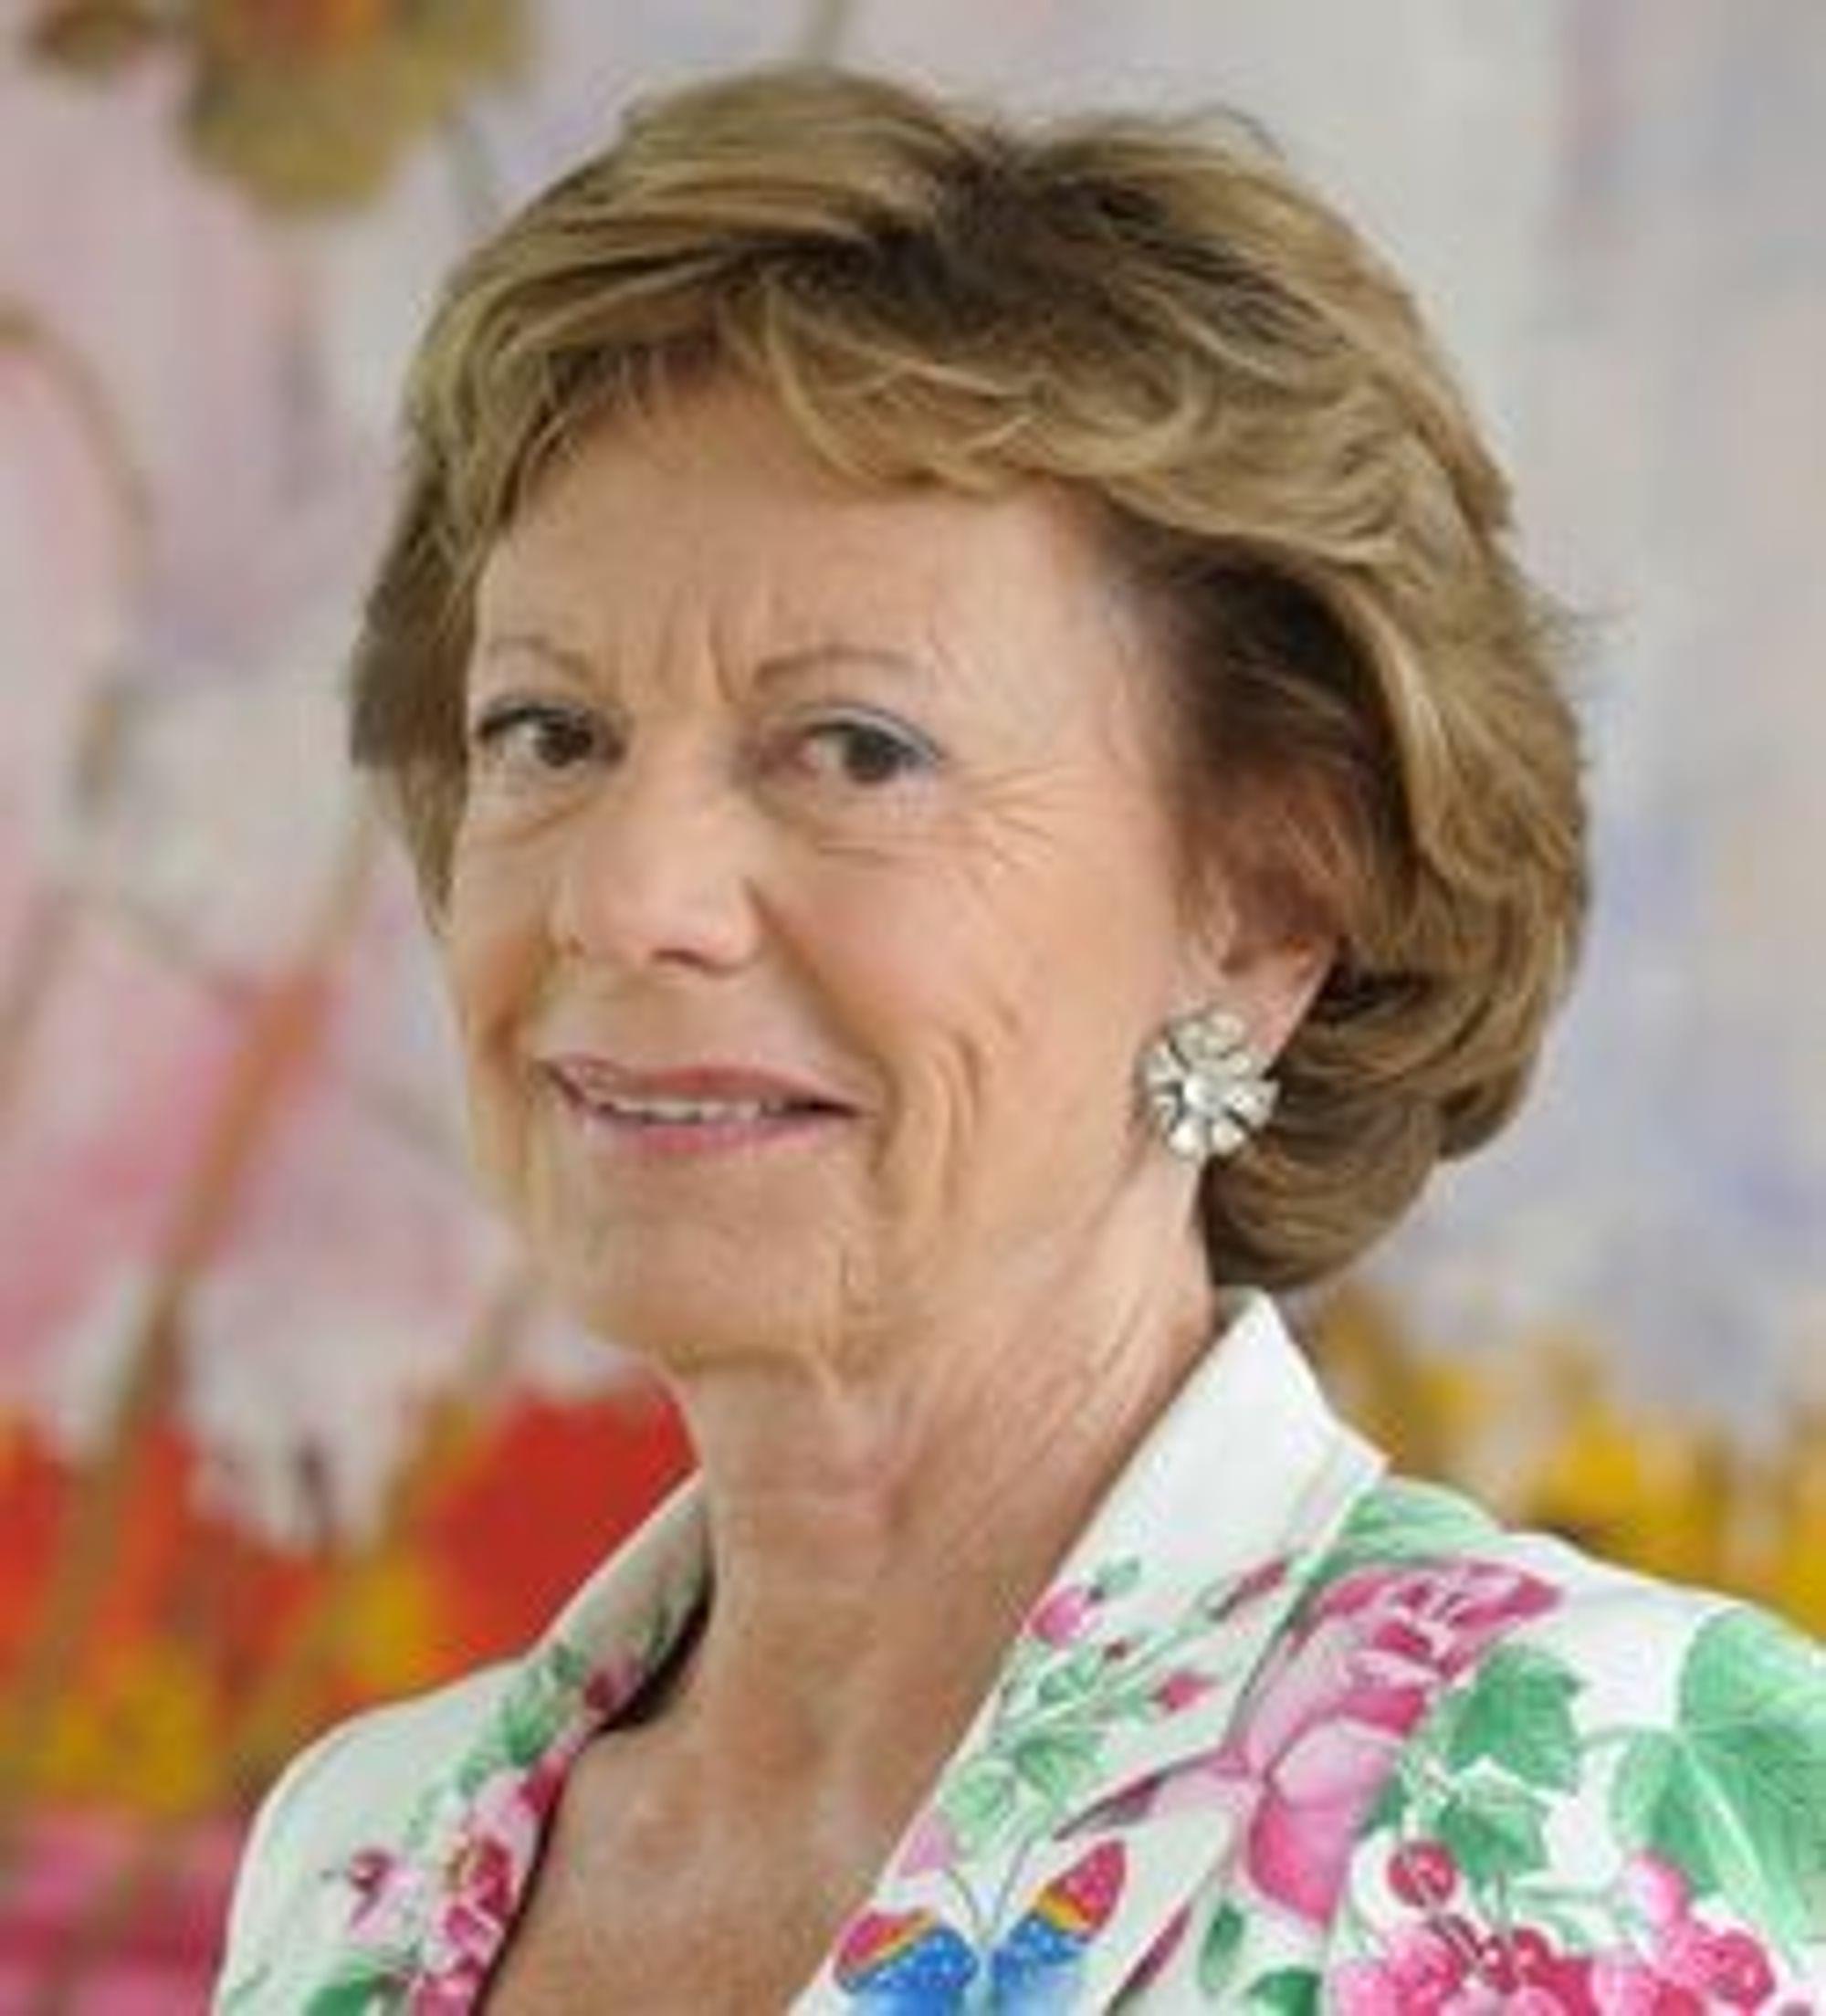 Sjef for EU-kommisjonens digitale agenda, Neelie Kroes.